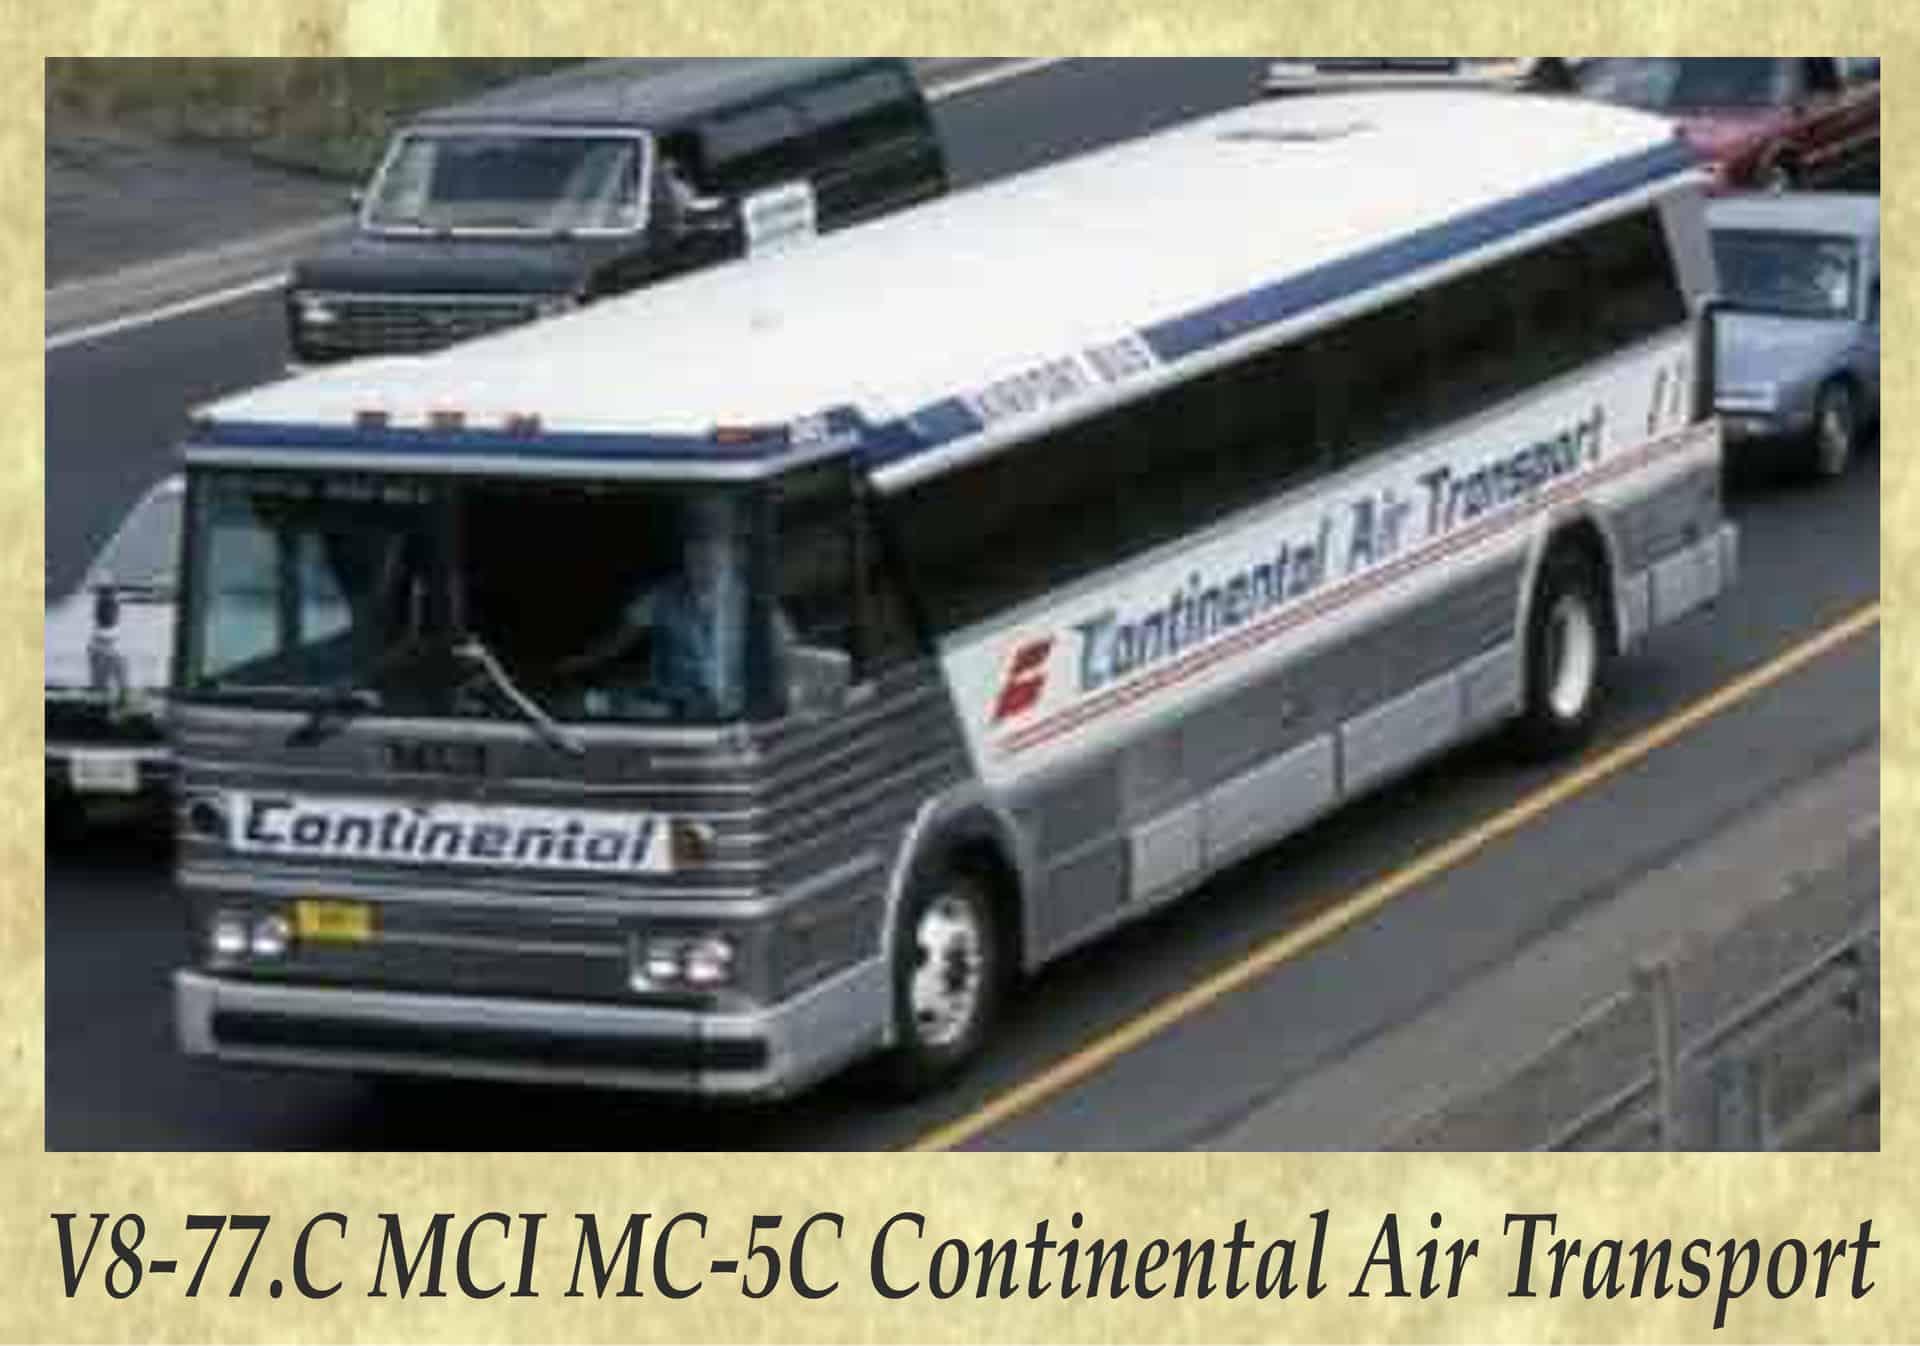 V8-77.C MCI MC-5C Continental Air Transport